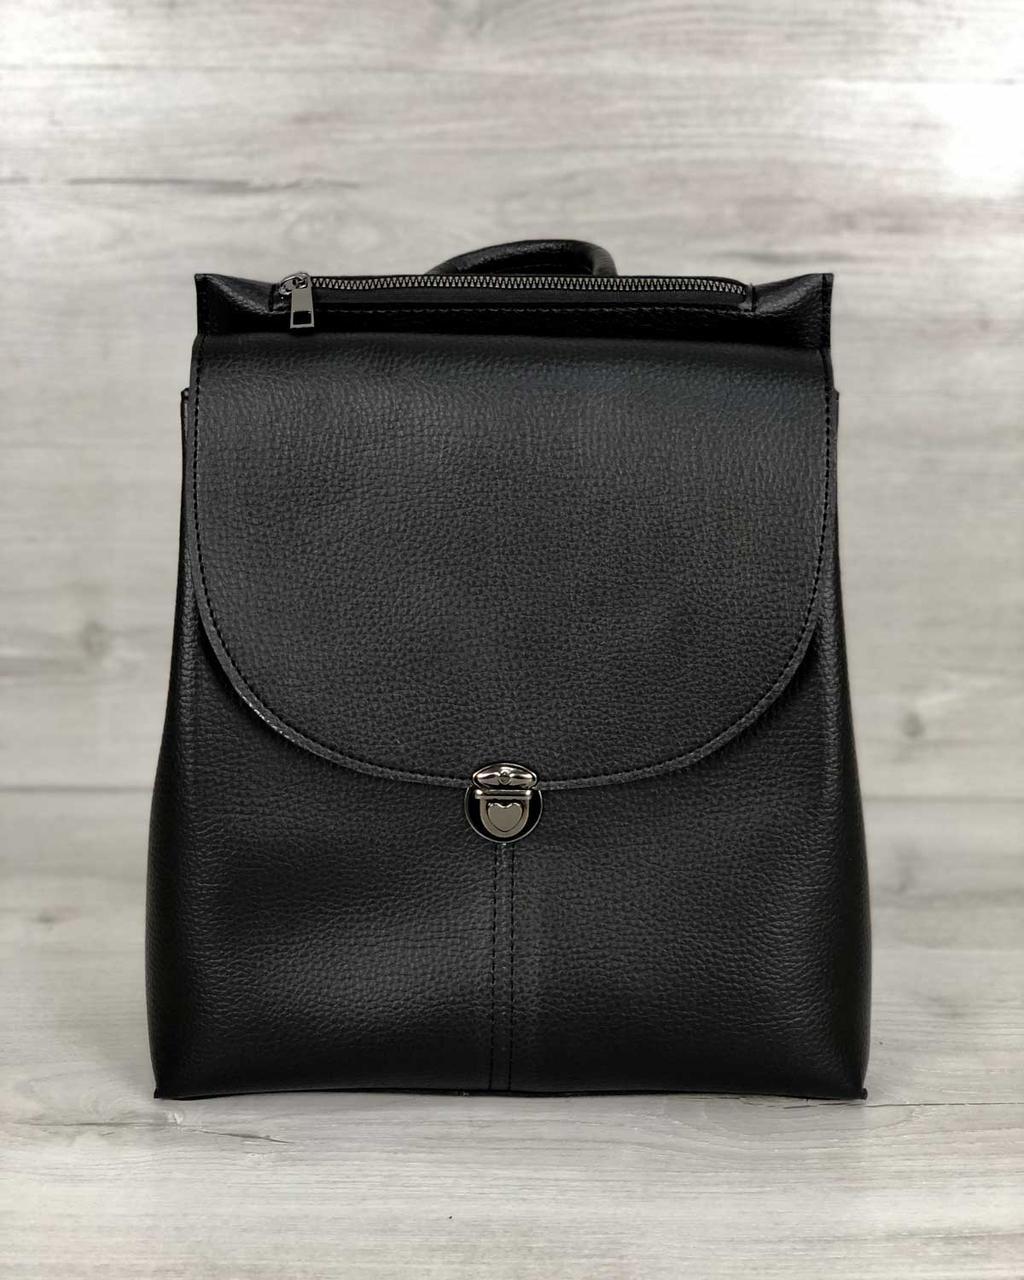 Сумка-рюкзак трансформер 45904 жіноча чорна молодіжна через плече, рюкзак на клямці